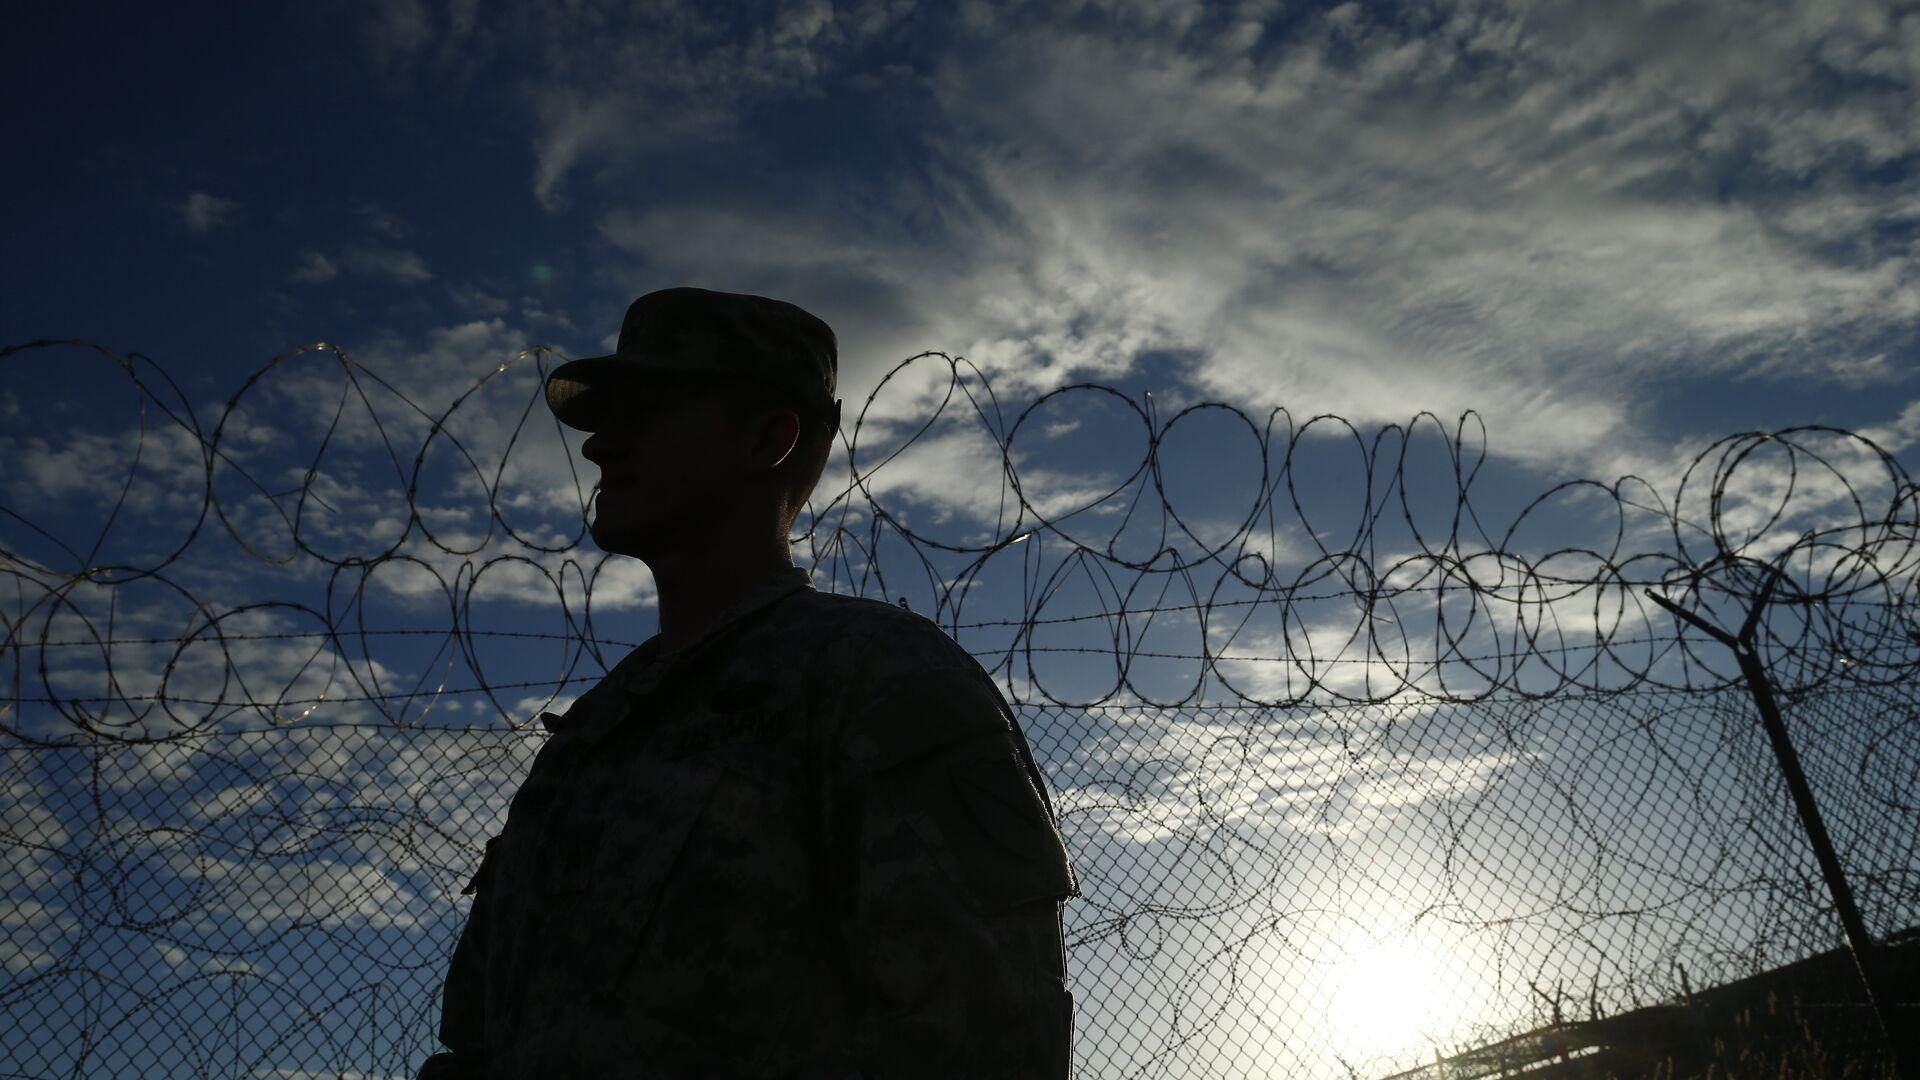 Soldado estadounidense en Guantánamo - Sputnik Mundo, 1920, 06.05.2021